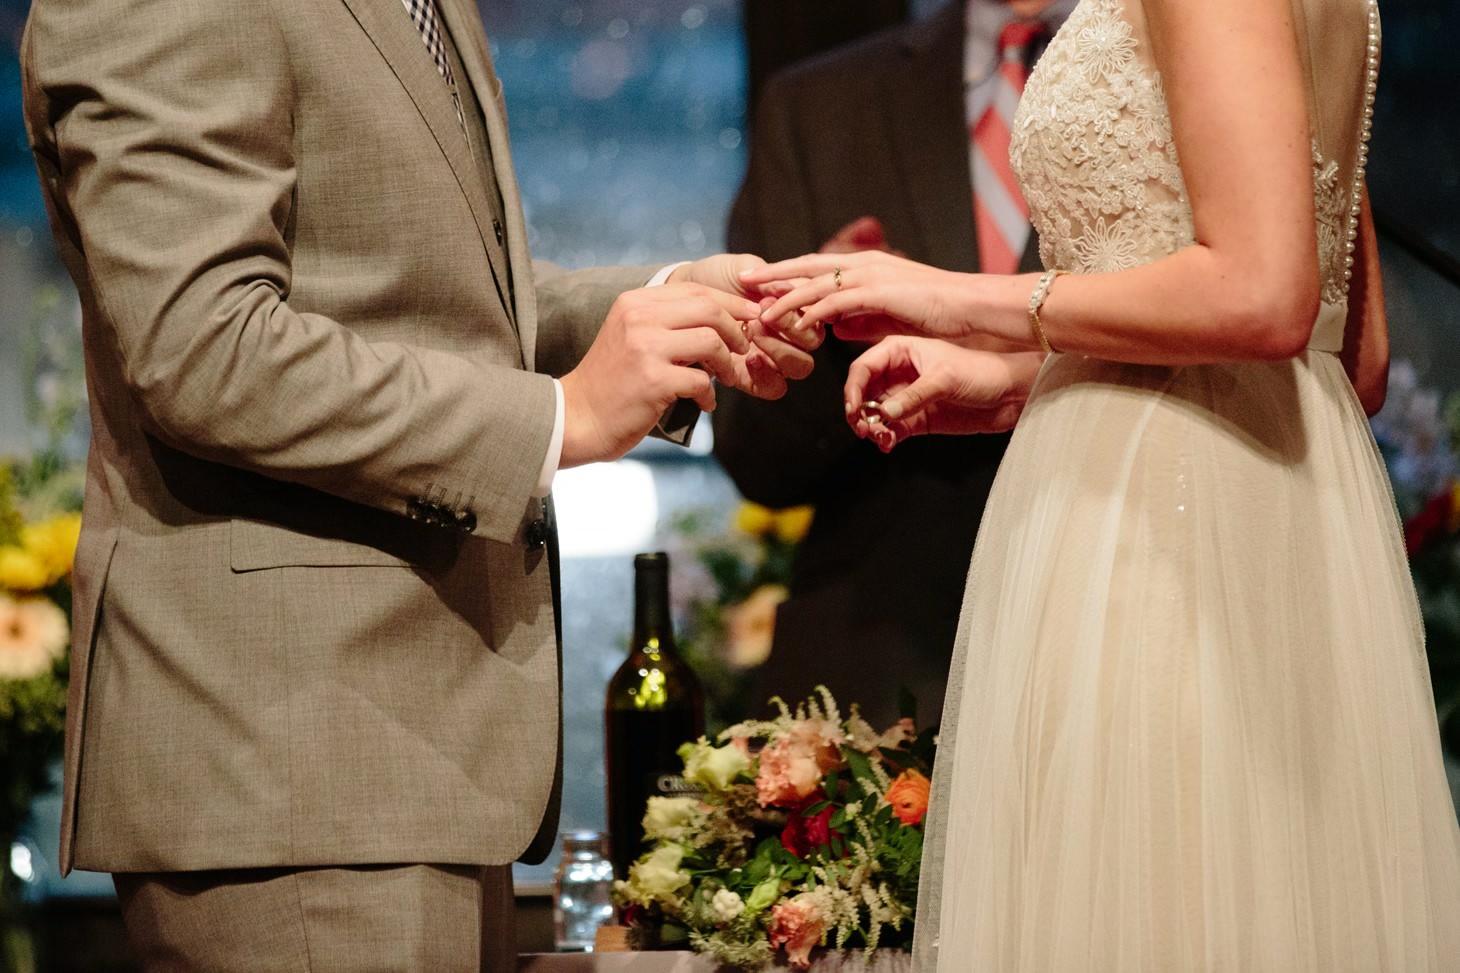 027-nyc-dumbo-loft-brooklyn-wedding-photographer-smitten-chickens-photo-.jpg